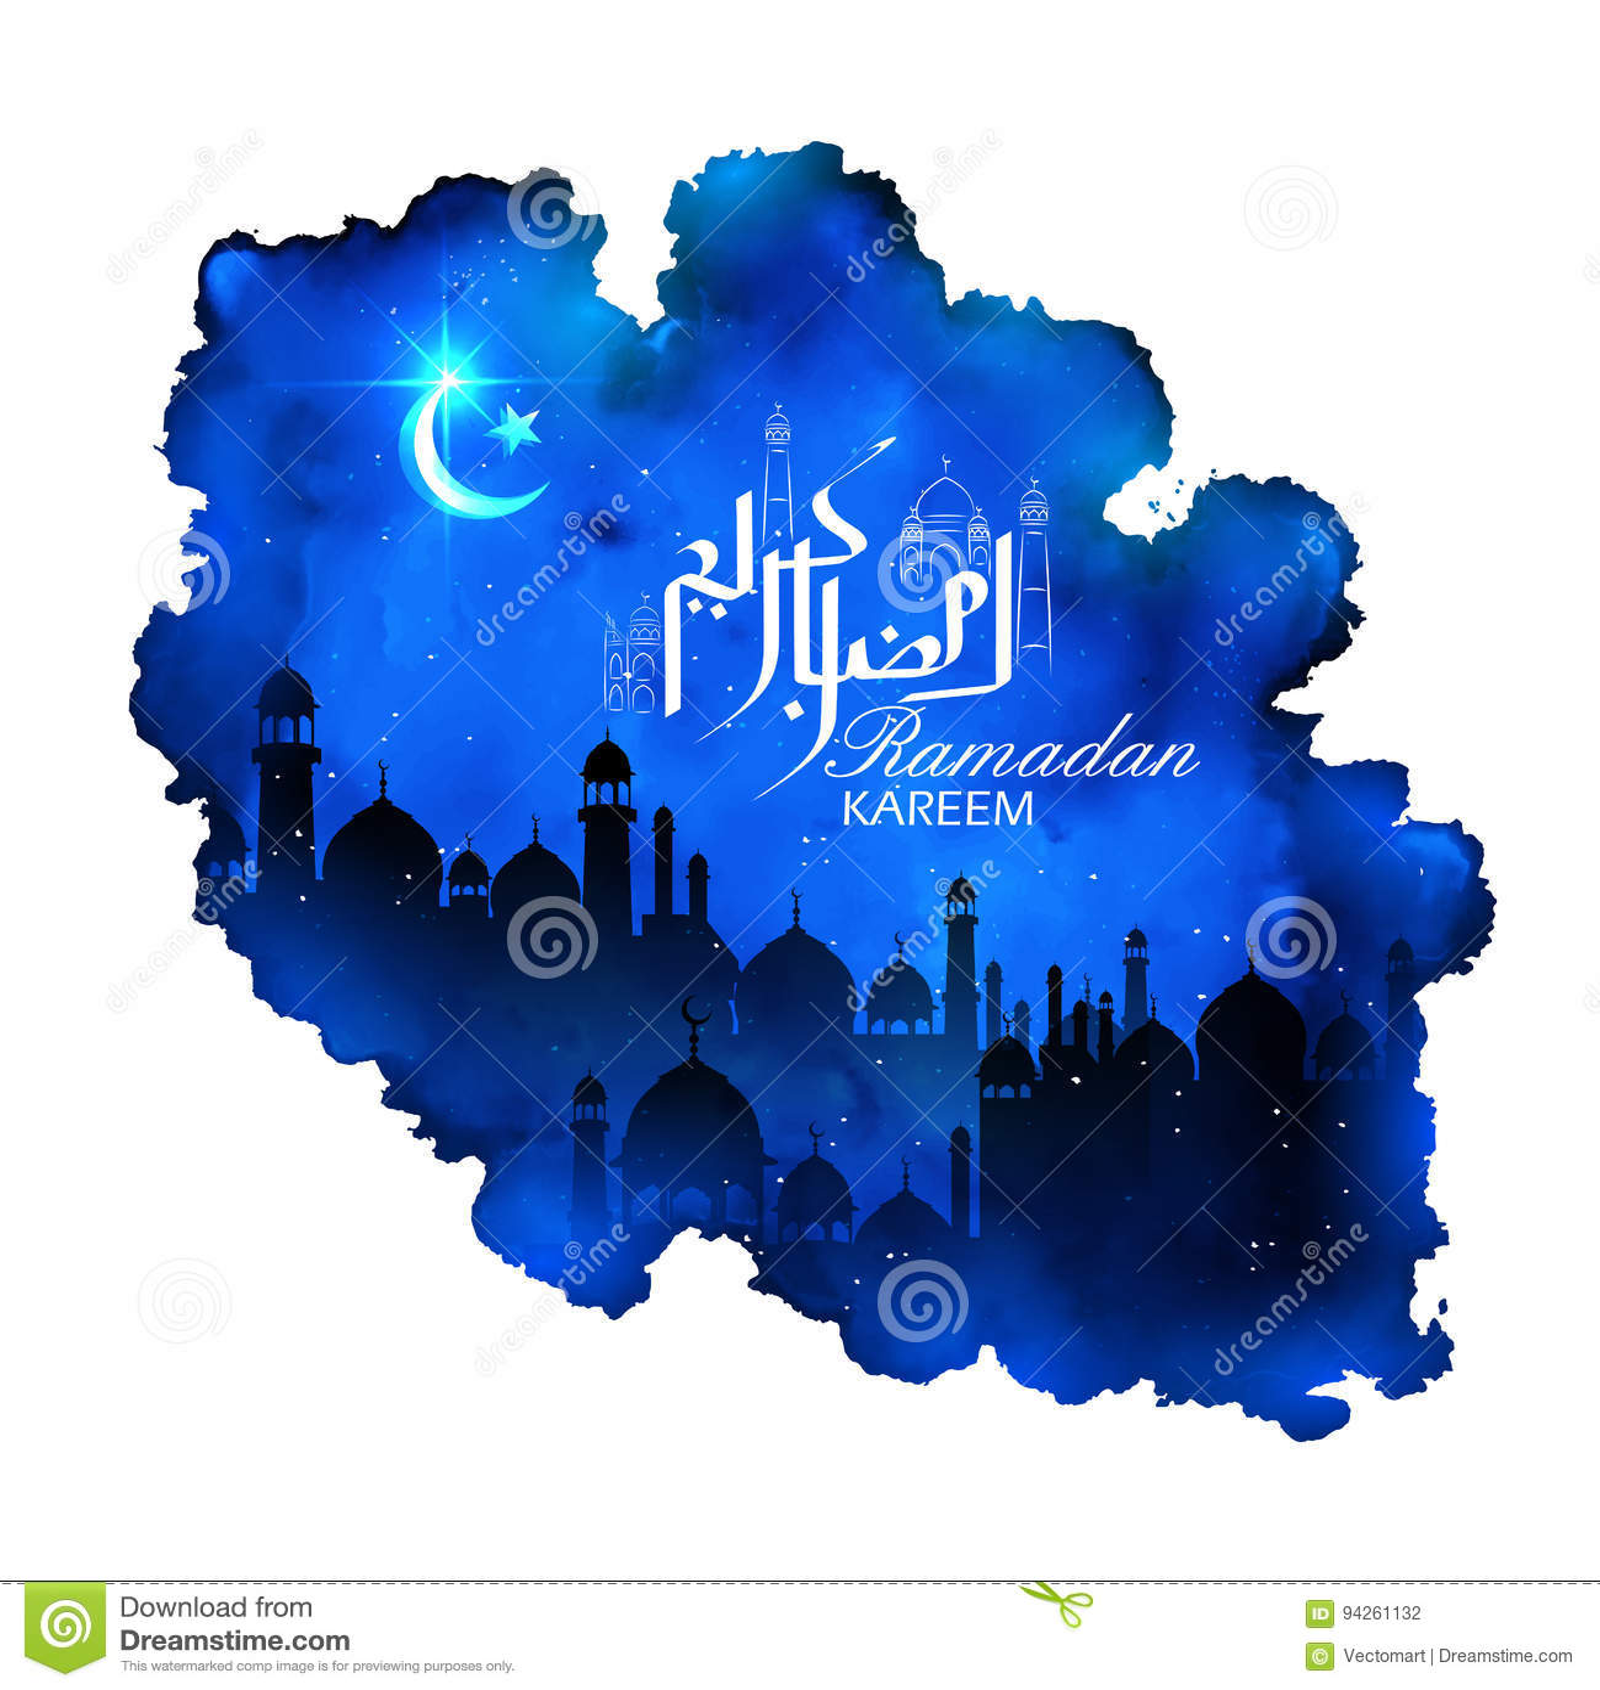 Ramadan Kareem Generous Ramadan Greetings In Arabic Freehand With